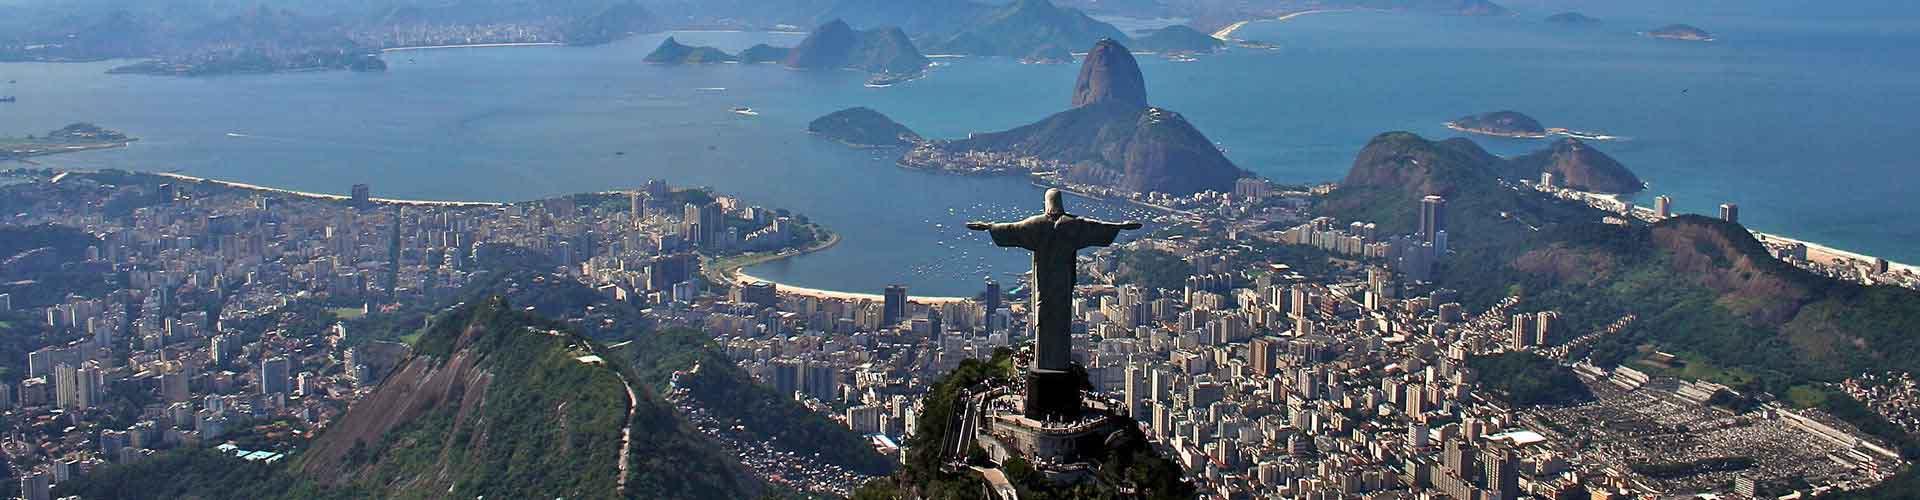 Rio de Janeiro – Huoneet kaupungiosassa Recreio Dos Bandeirantes. Rio de Janeiro -karttoja, valokuvia ja arvosteluja kaikista Rio de Janeiro -huoneista.